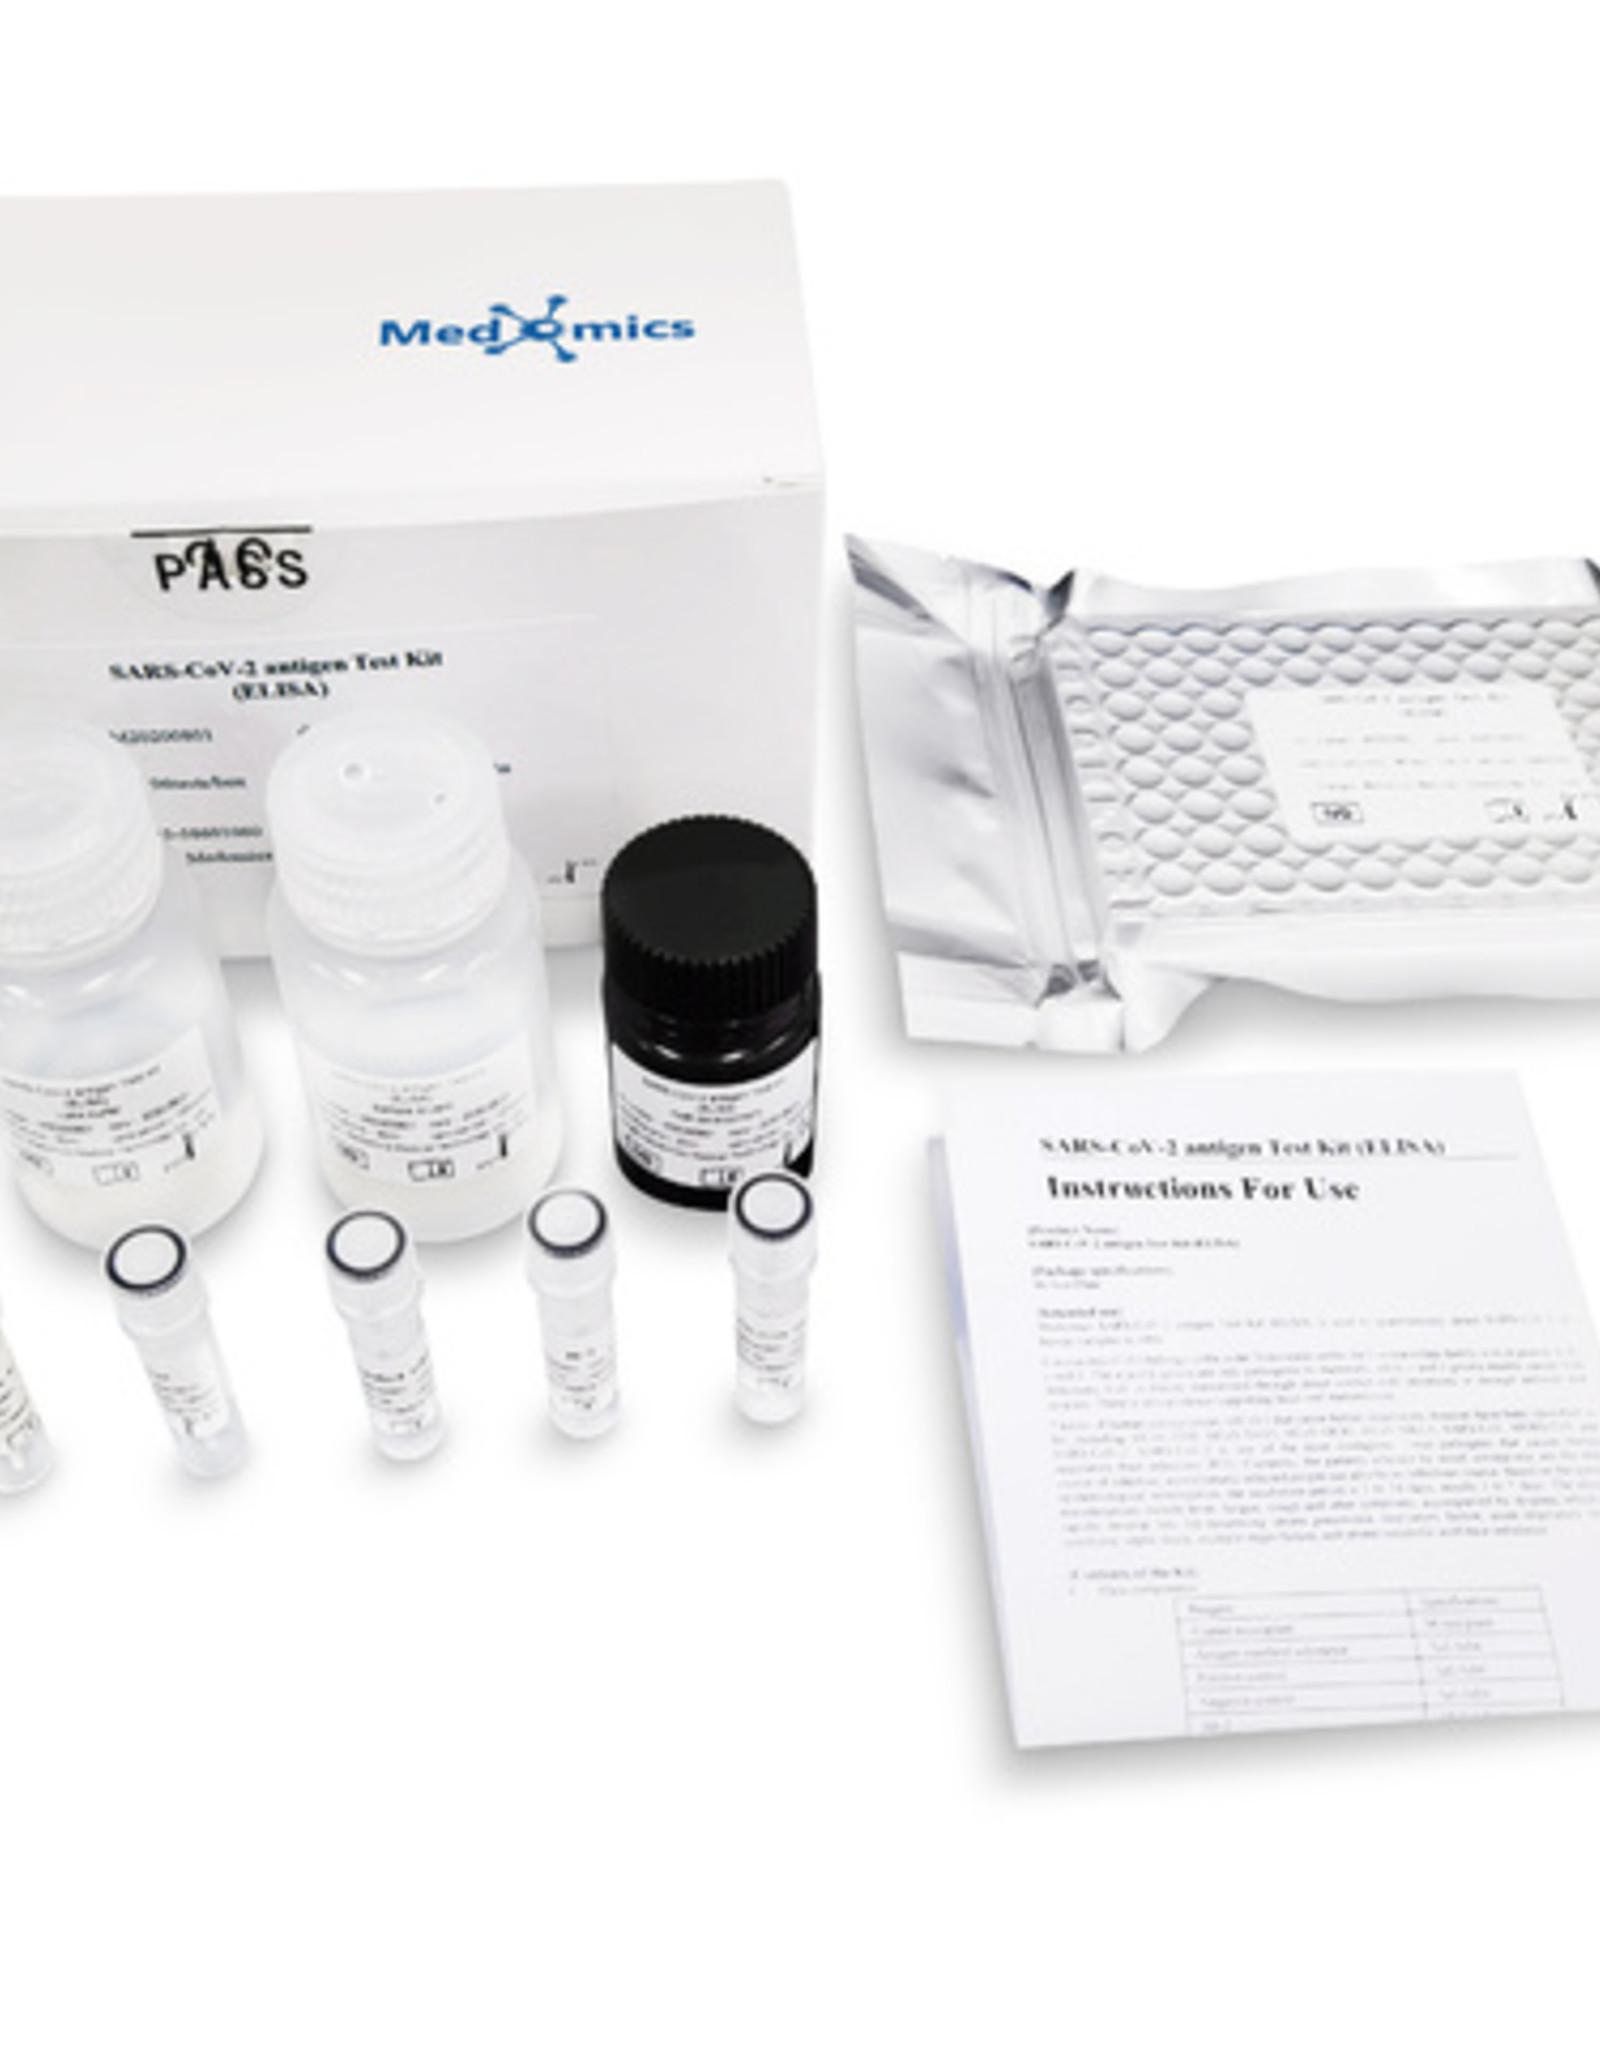 Medomics SARS-CoV-2 Neutralizing Antibody Test Kit (ELISA) - 20 tests